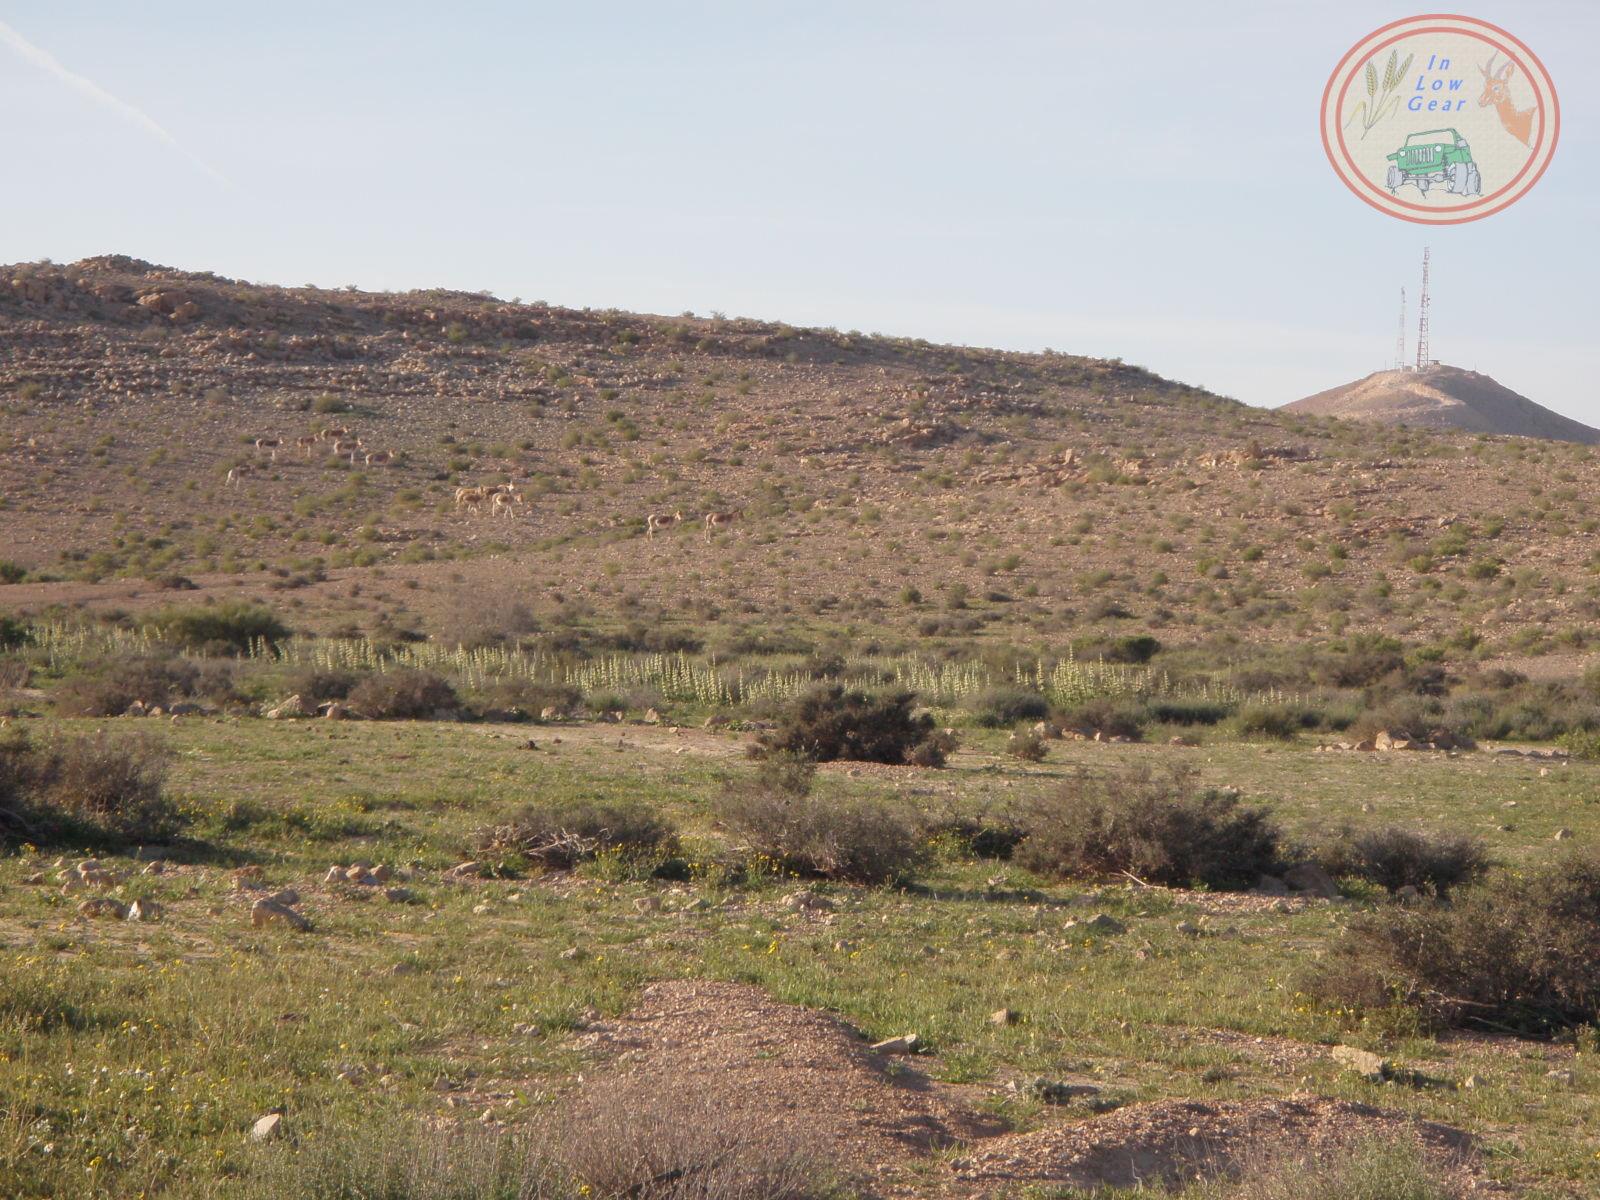 Arod wild ass at Kadesh Barnea jeep tours. עדר ערודים באזור קדש ברנע, טיולי ג'יפים